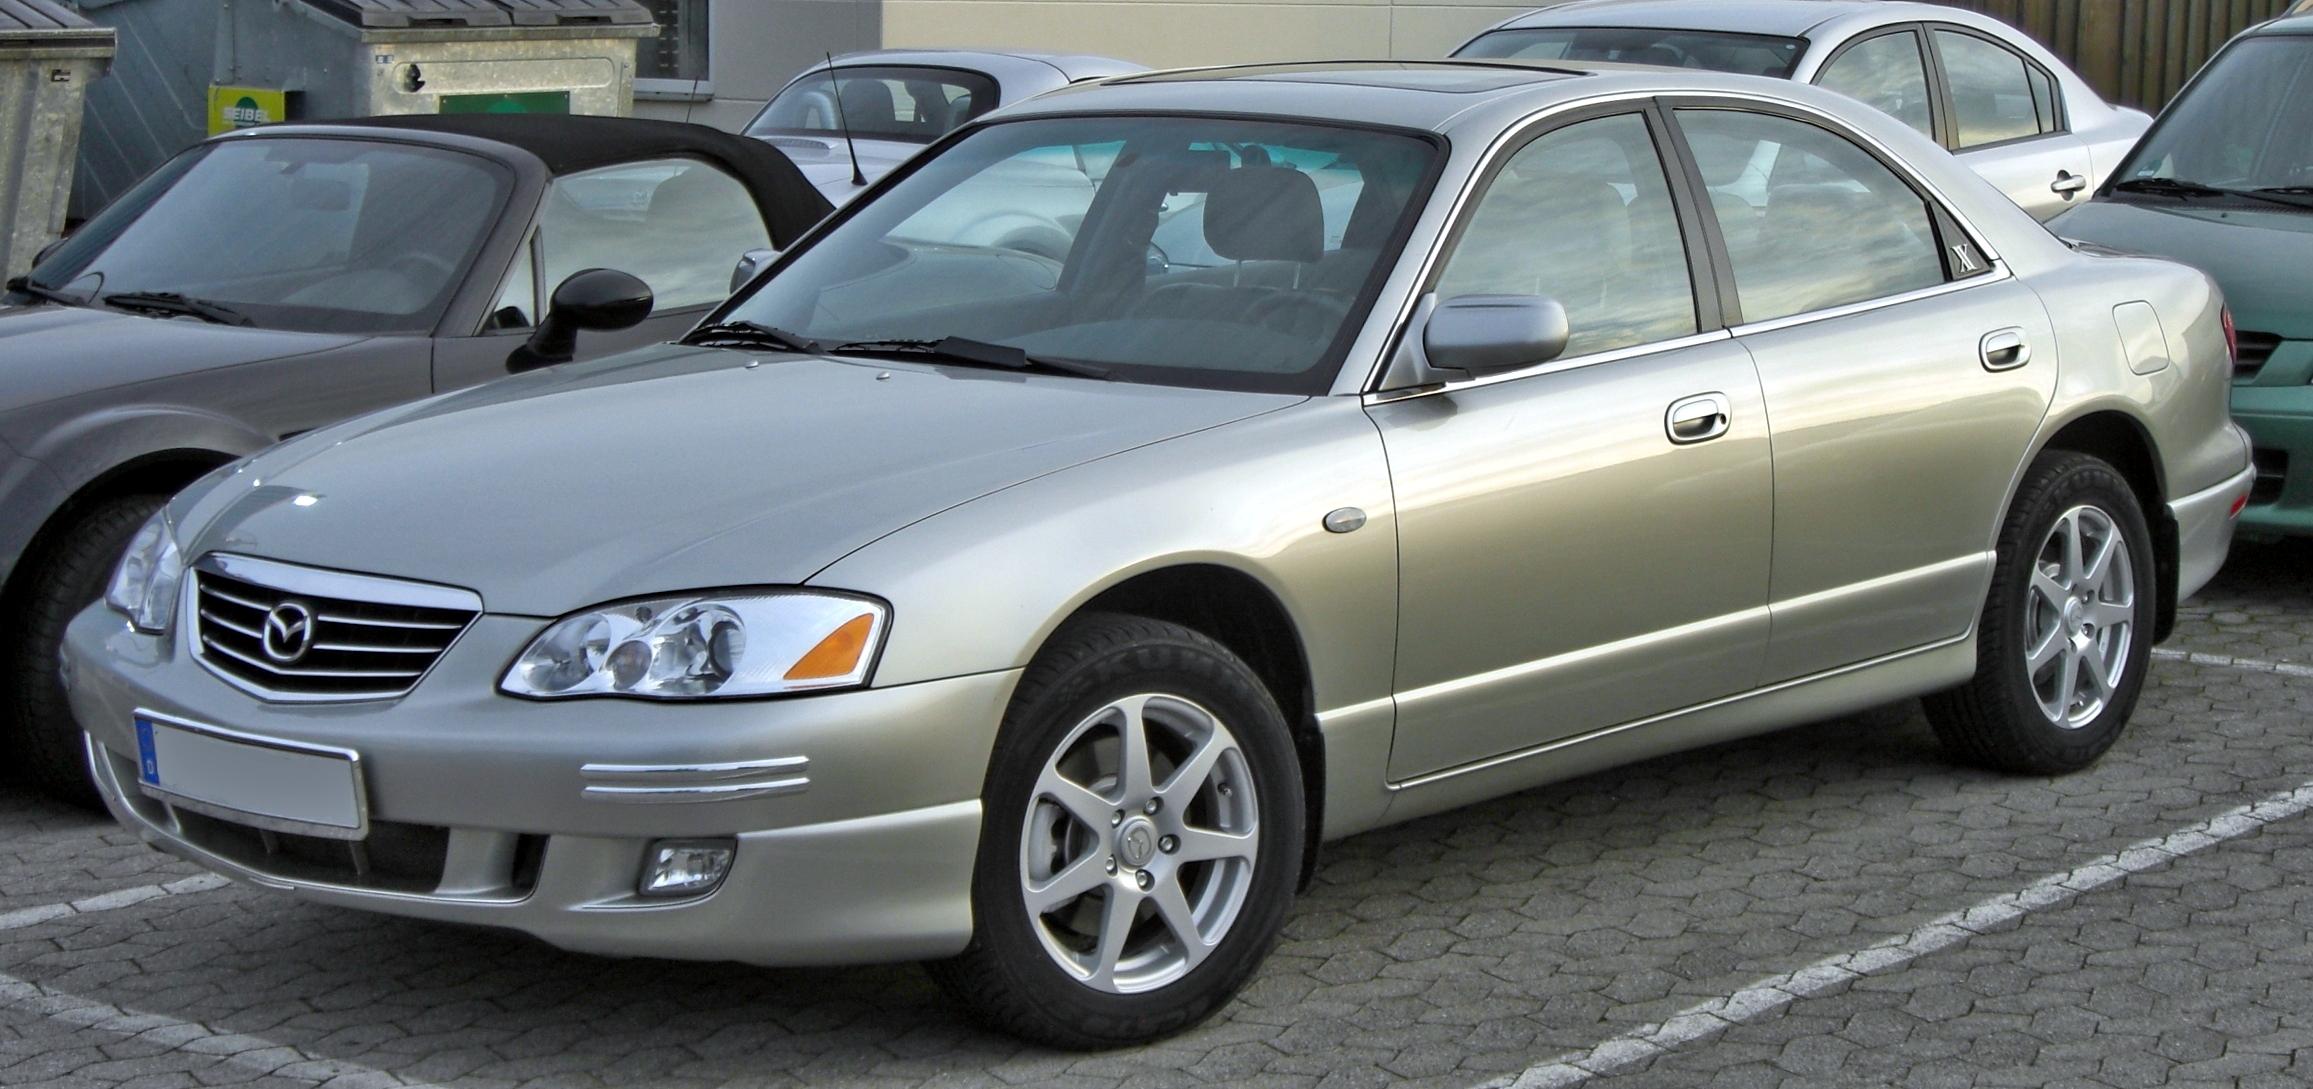 https://upload.wikimedia.org/wikipedia/commons/f/ff/Mazda_Xedos_9_2.Facelift_%28seit_2000%29_front.jpg